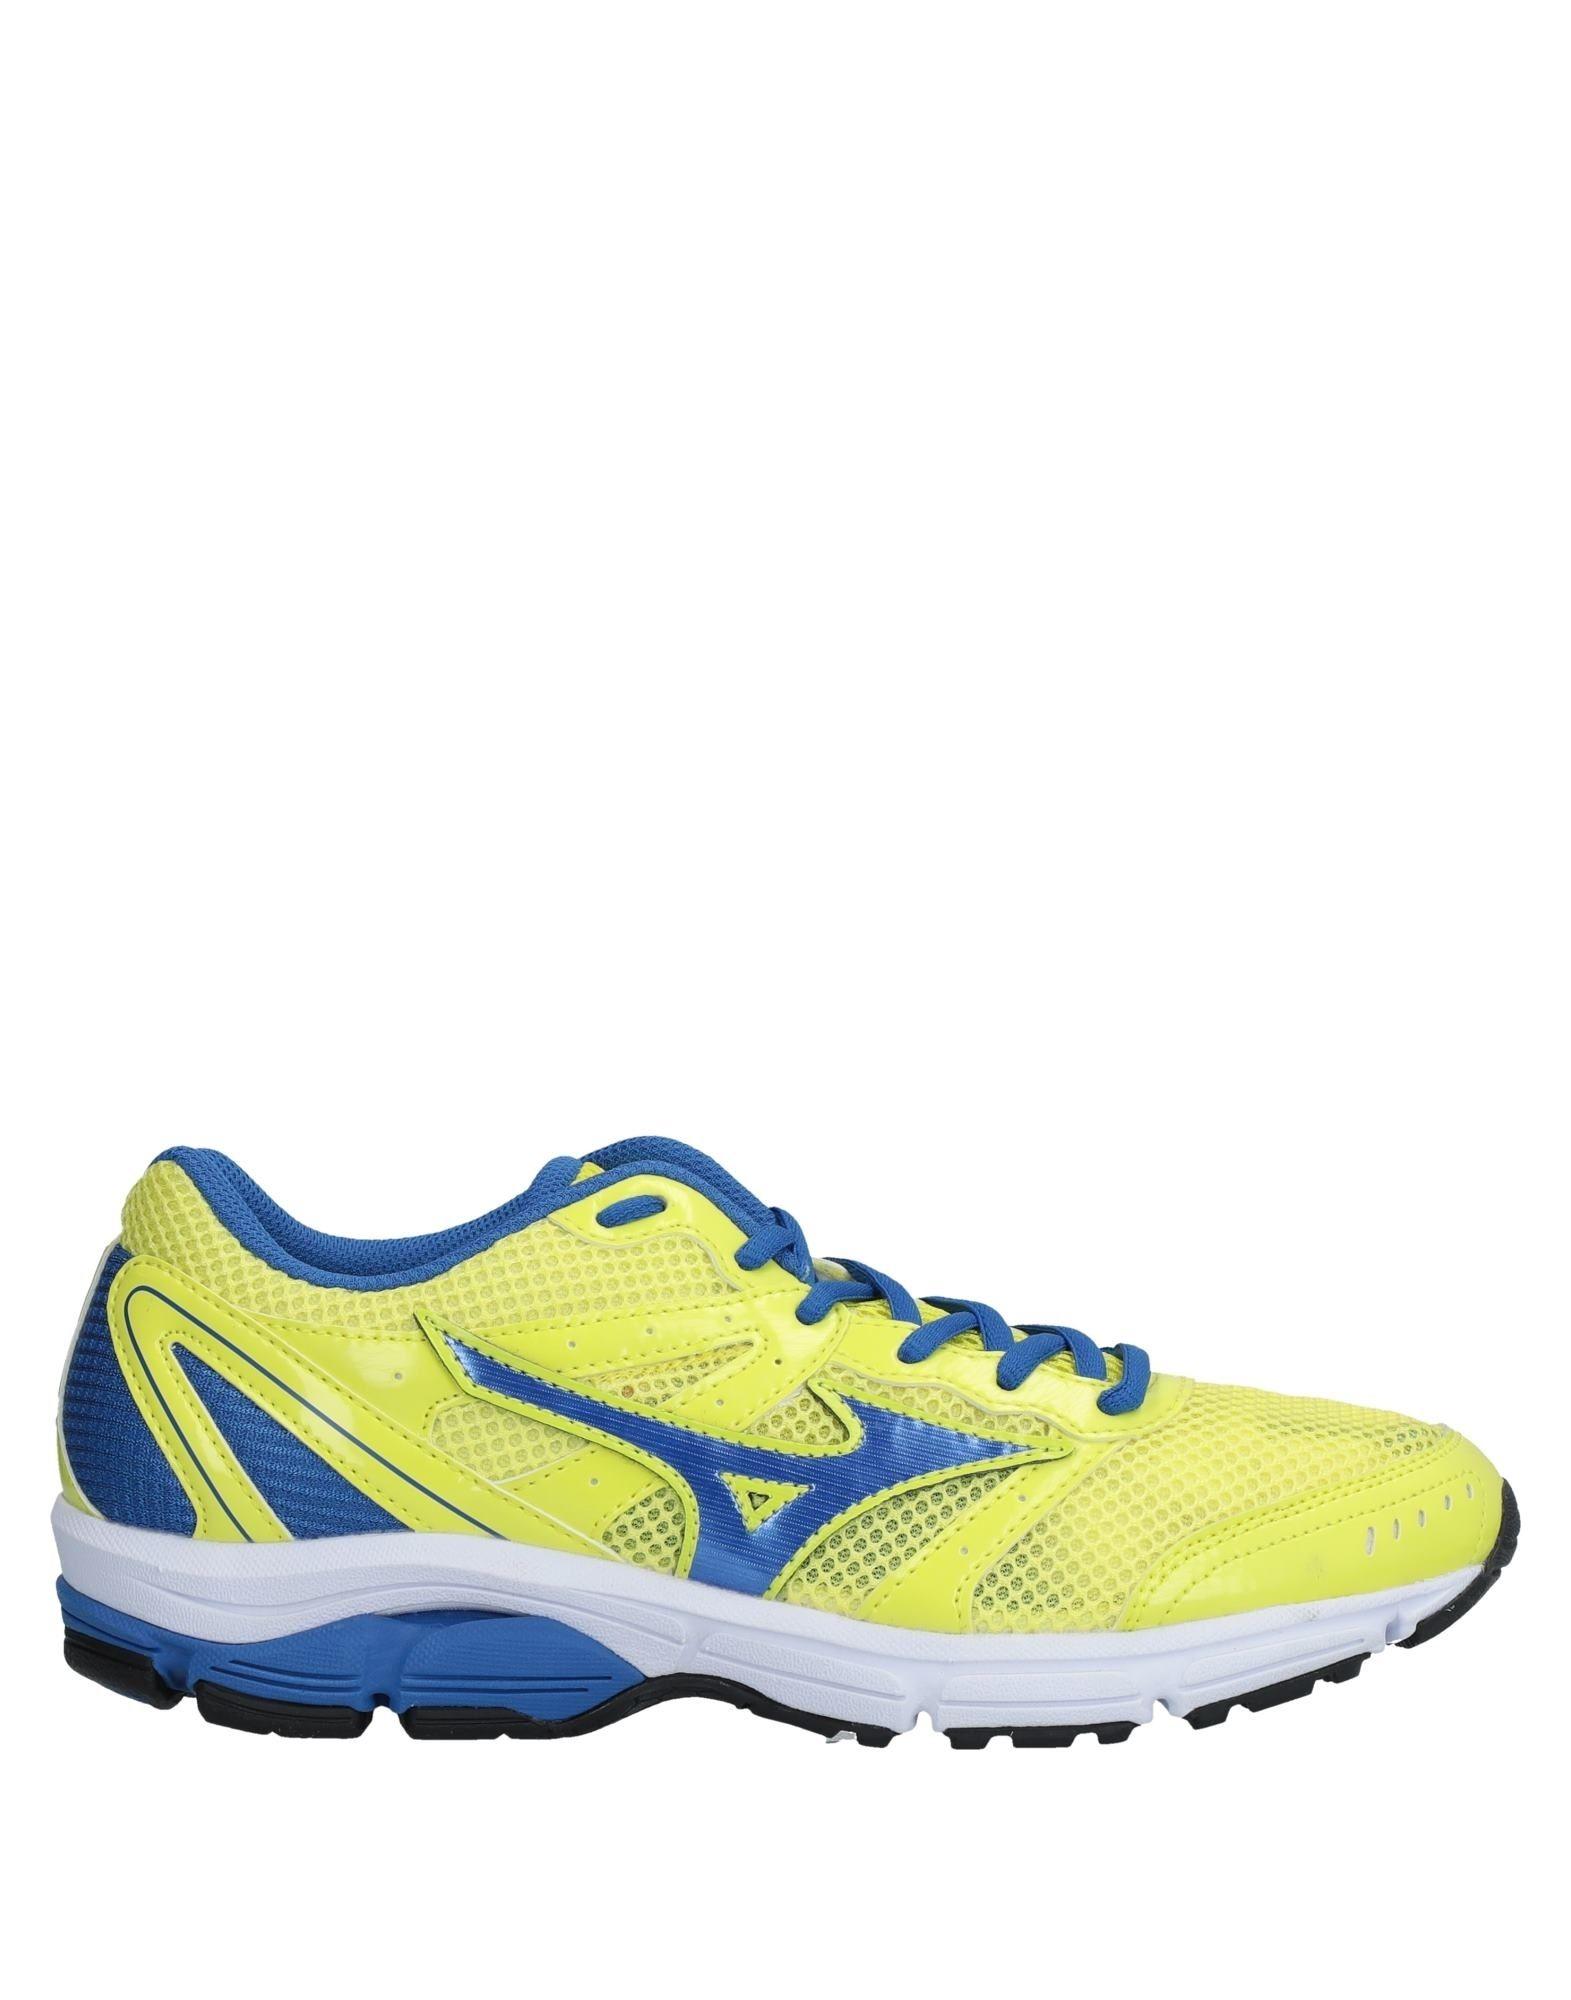 Mizuno on Sneakers - Men Mizuno Sneakers online on Mizuno  Canada - 11544446GA 186ea3